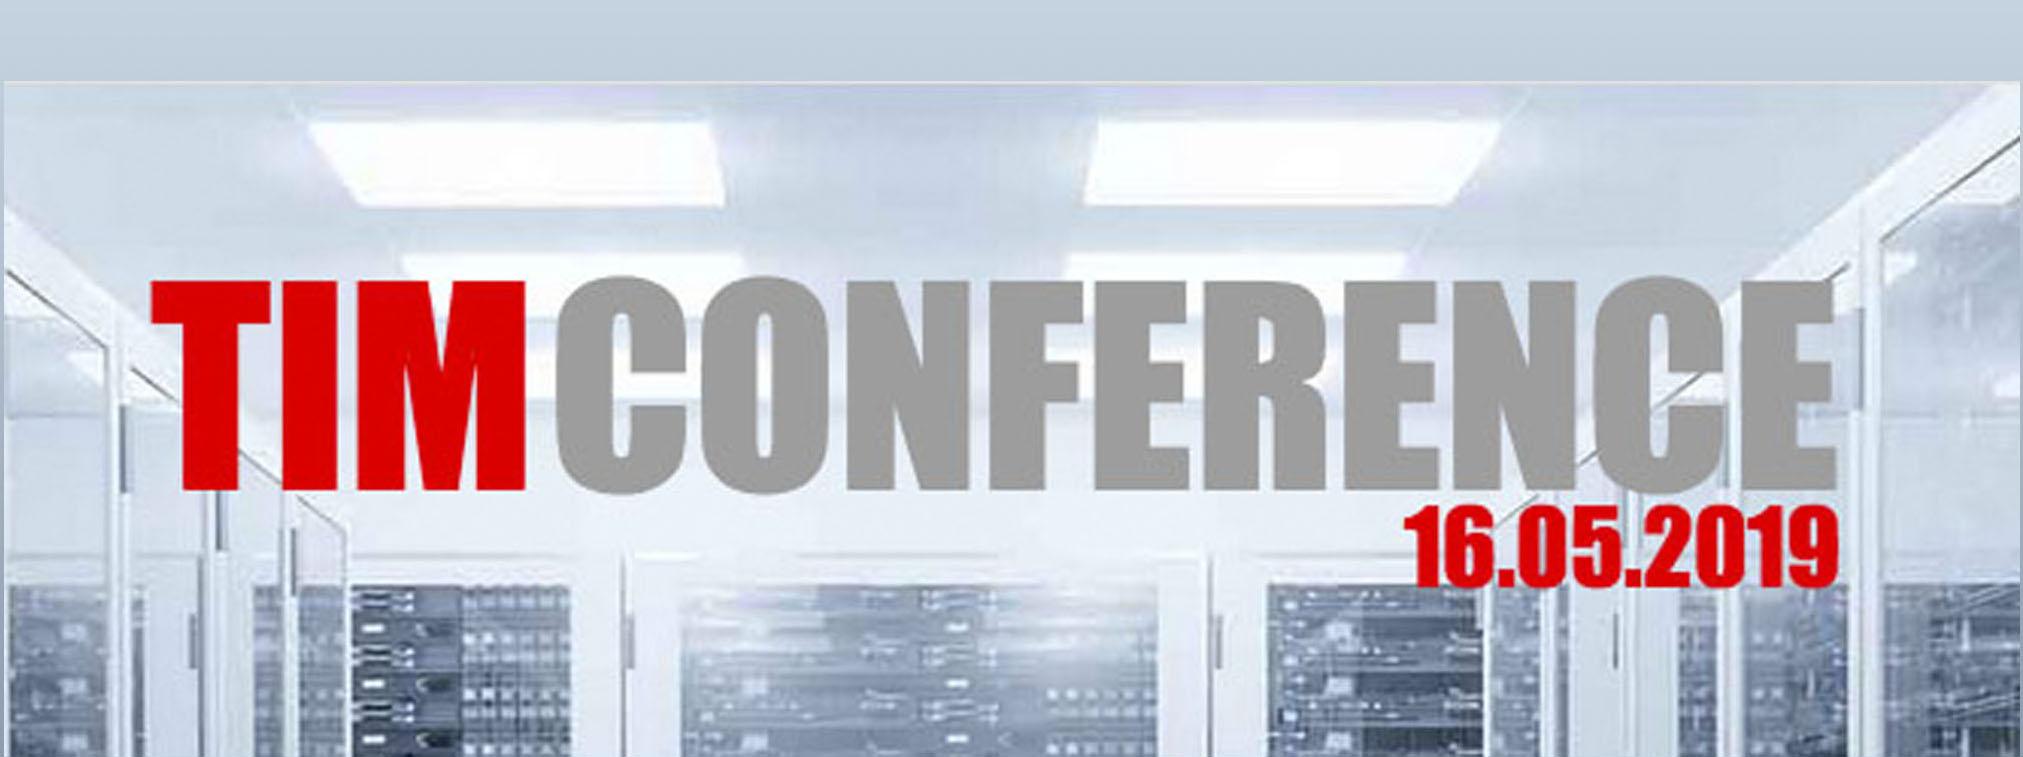 TIM Conference im RMCC am 16. Mai 2019